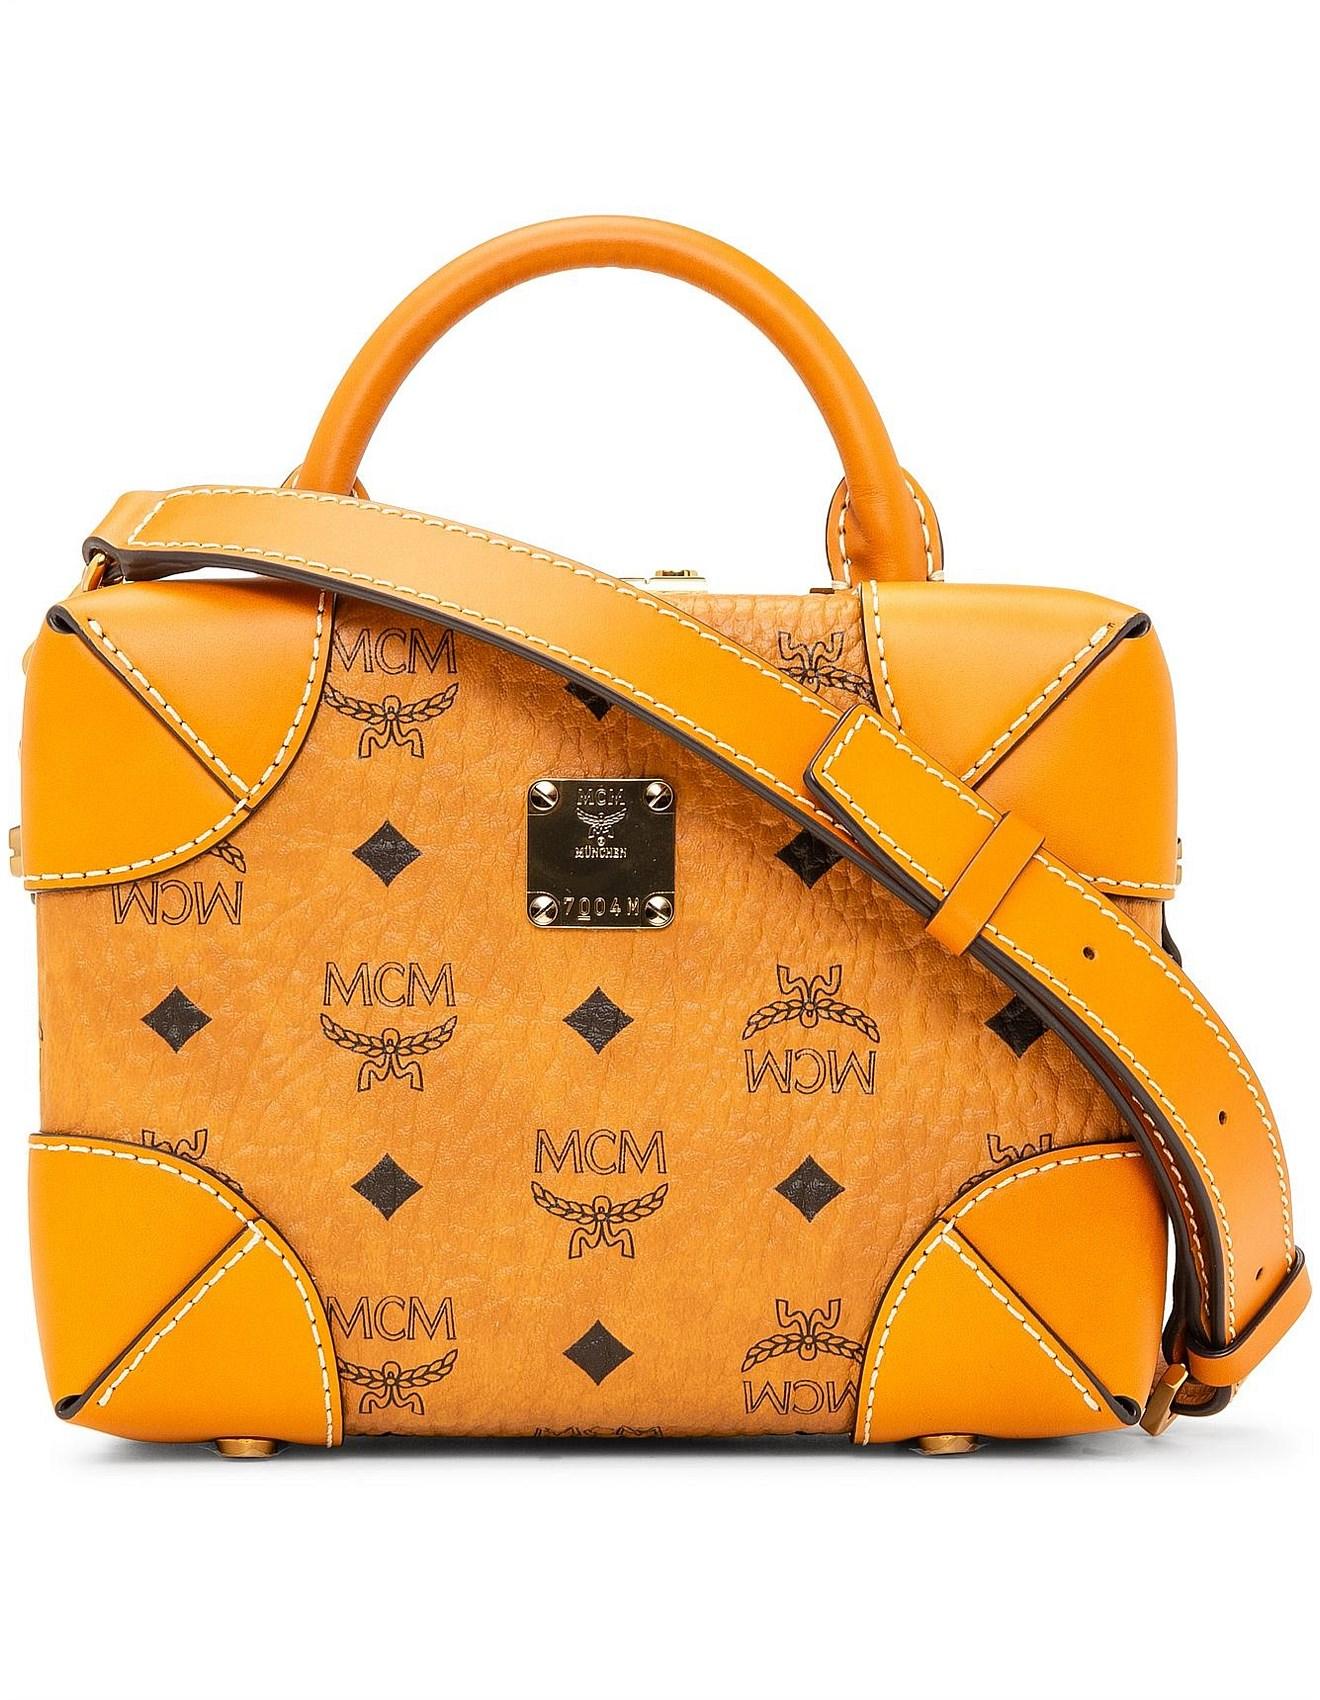 Womens Bags SOFT BERLIN VISETOS CROSSBODY SMALL